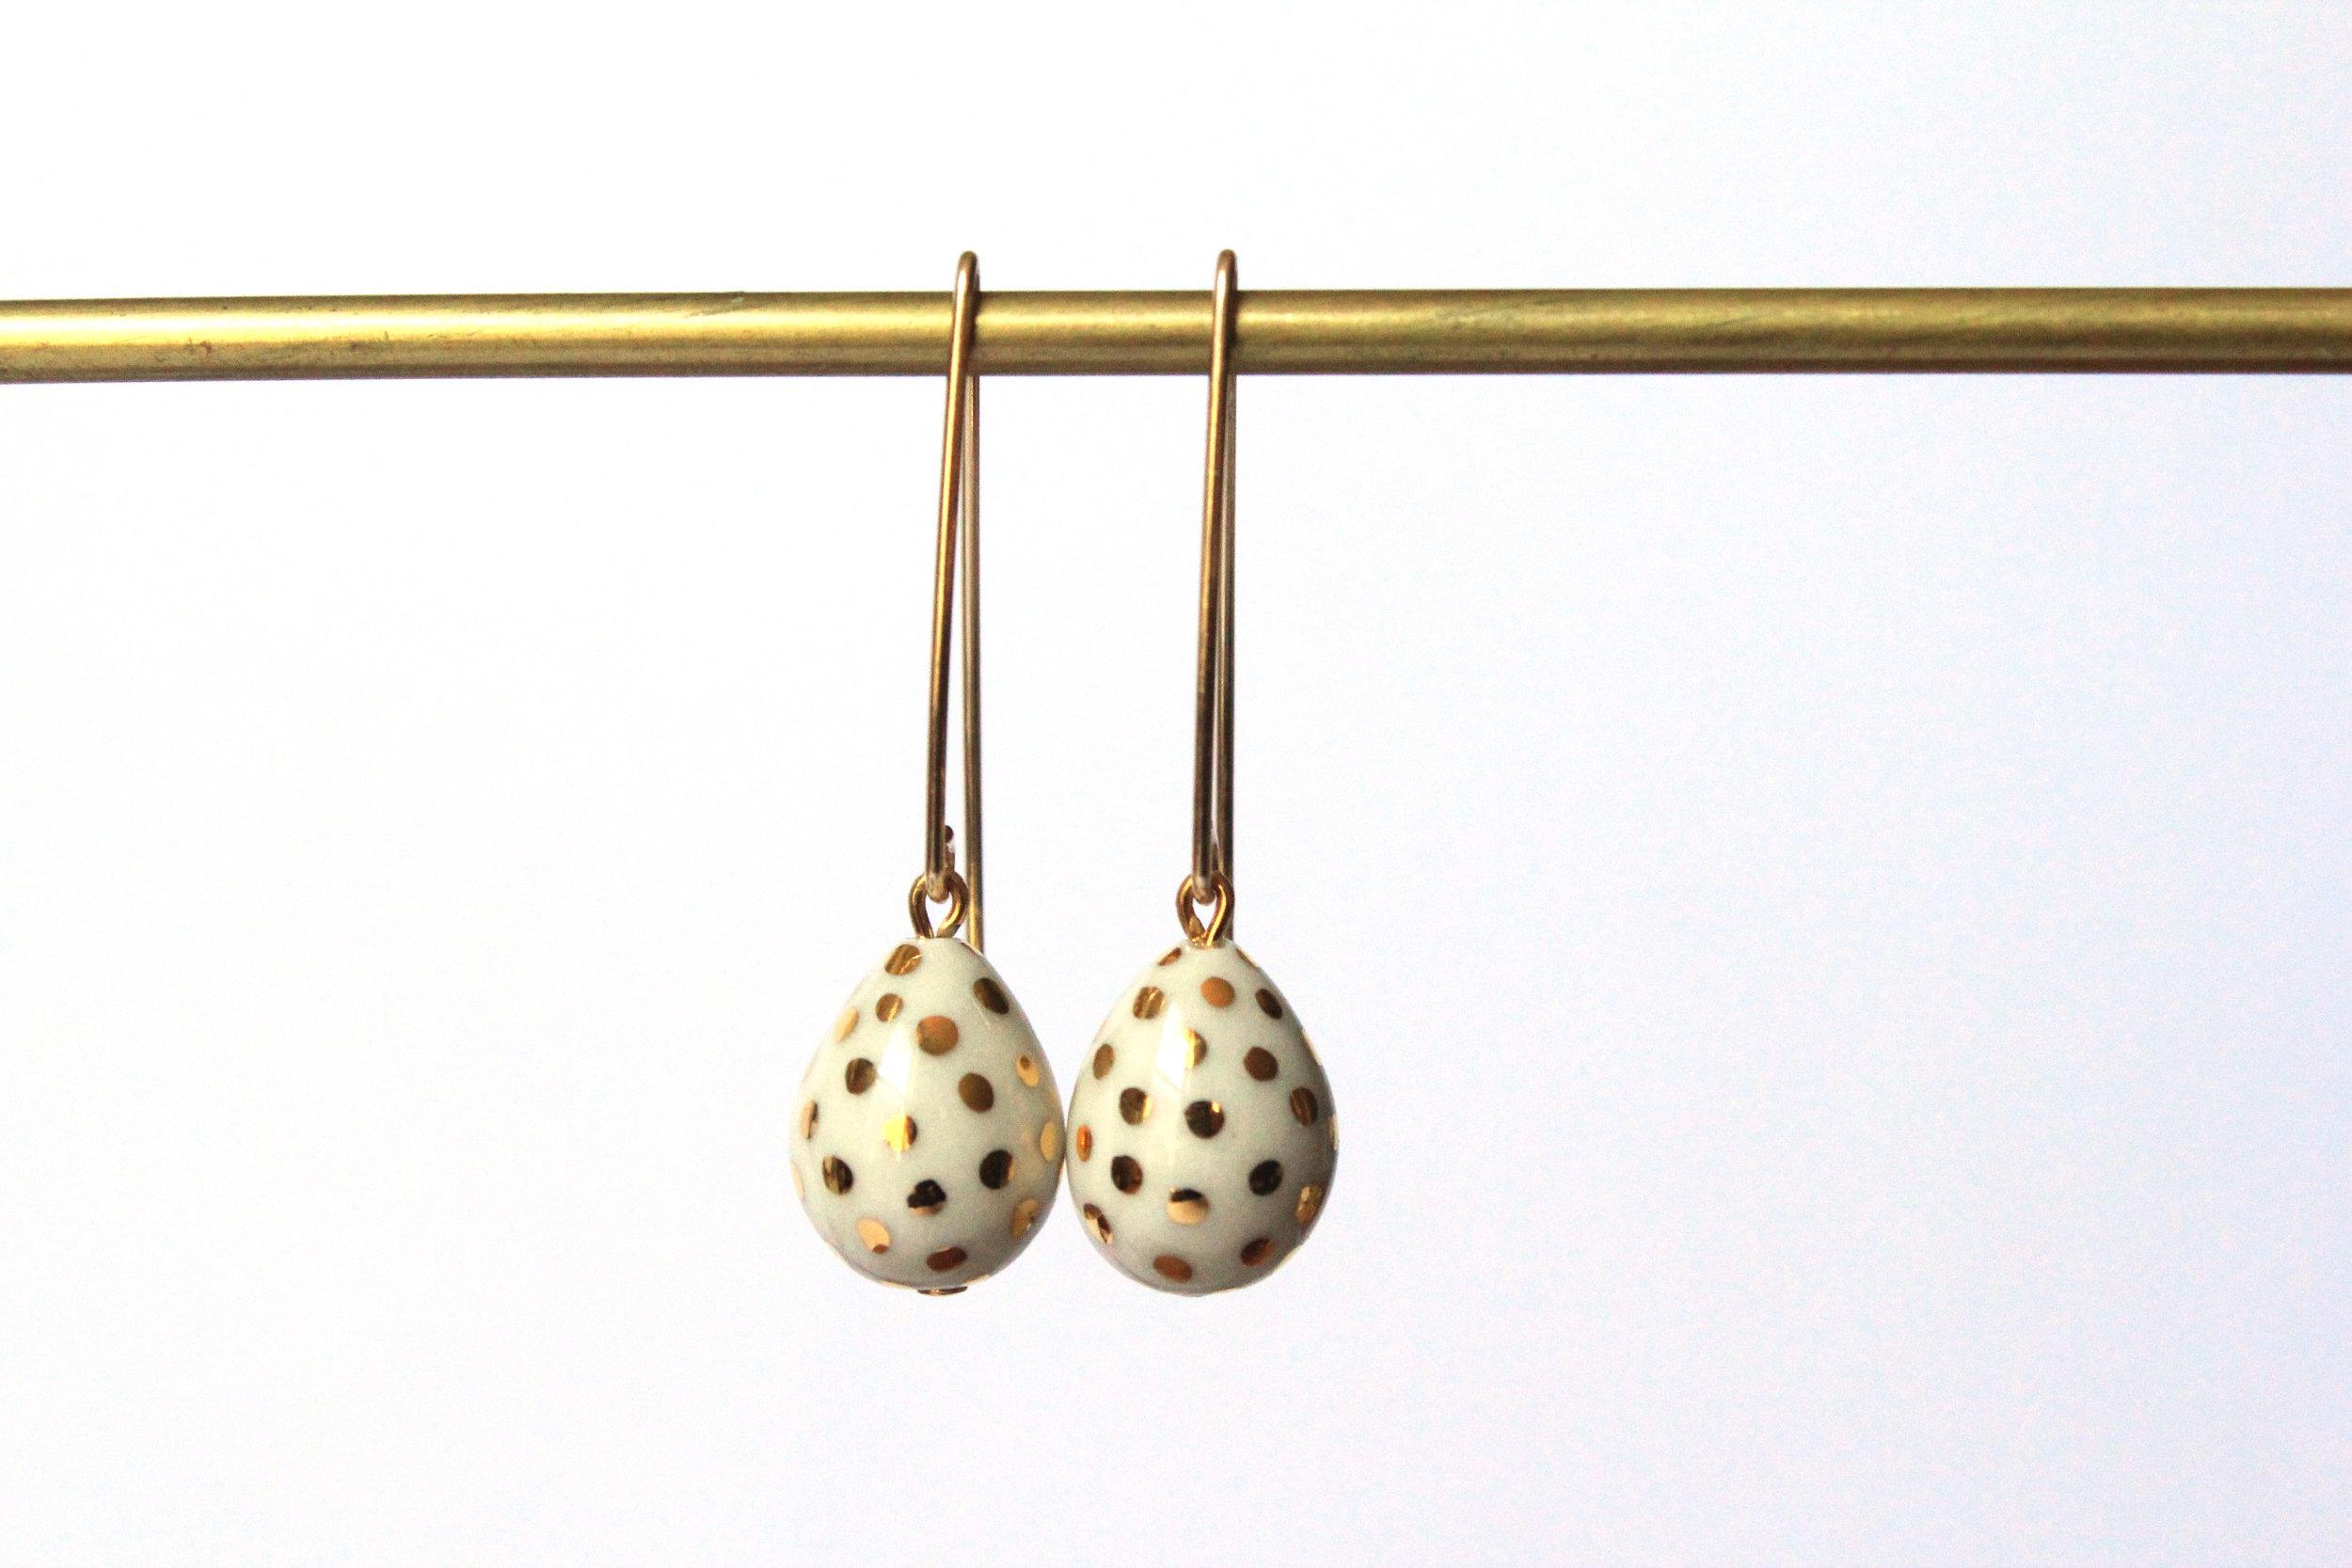 Ladybug Teardrop White Earrings